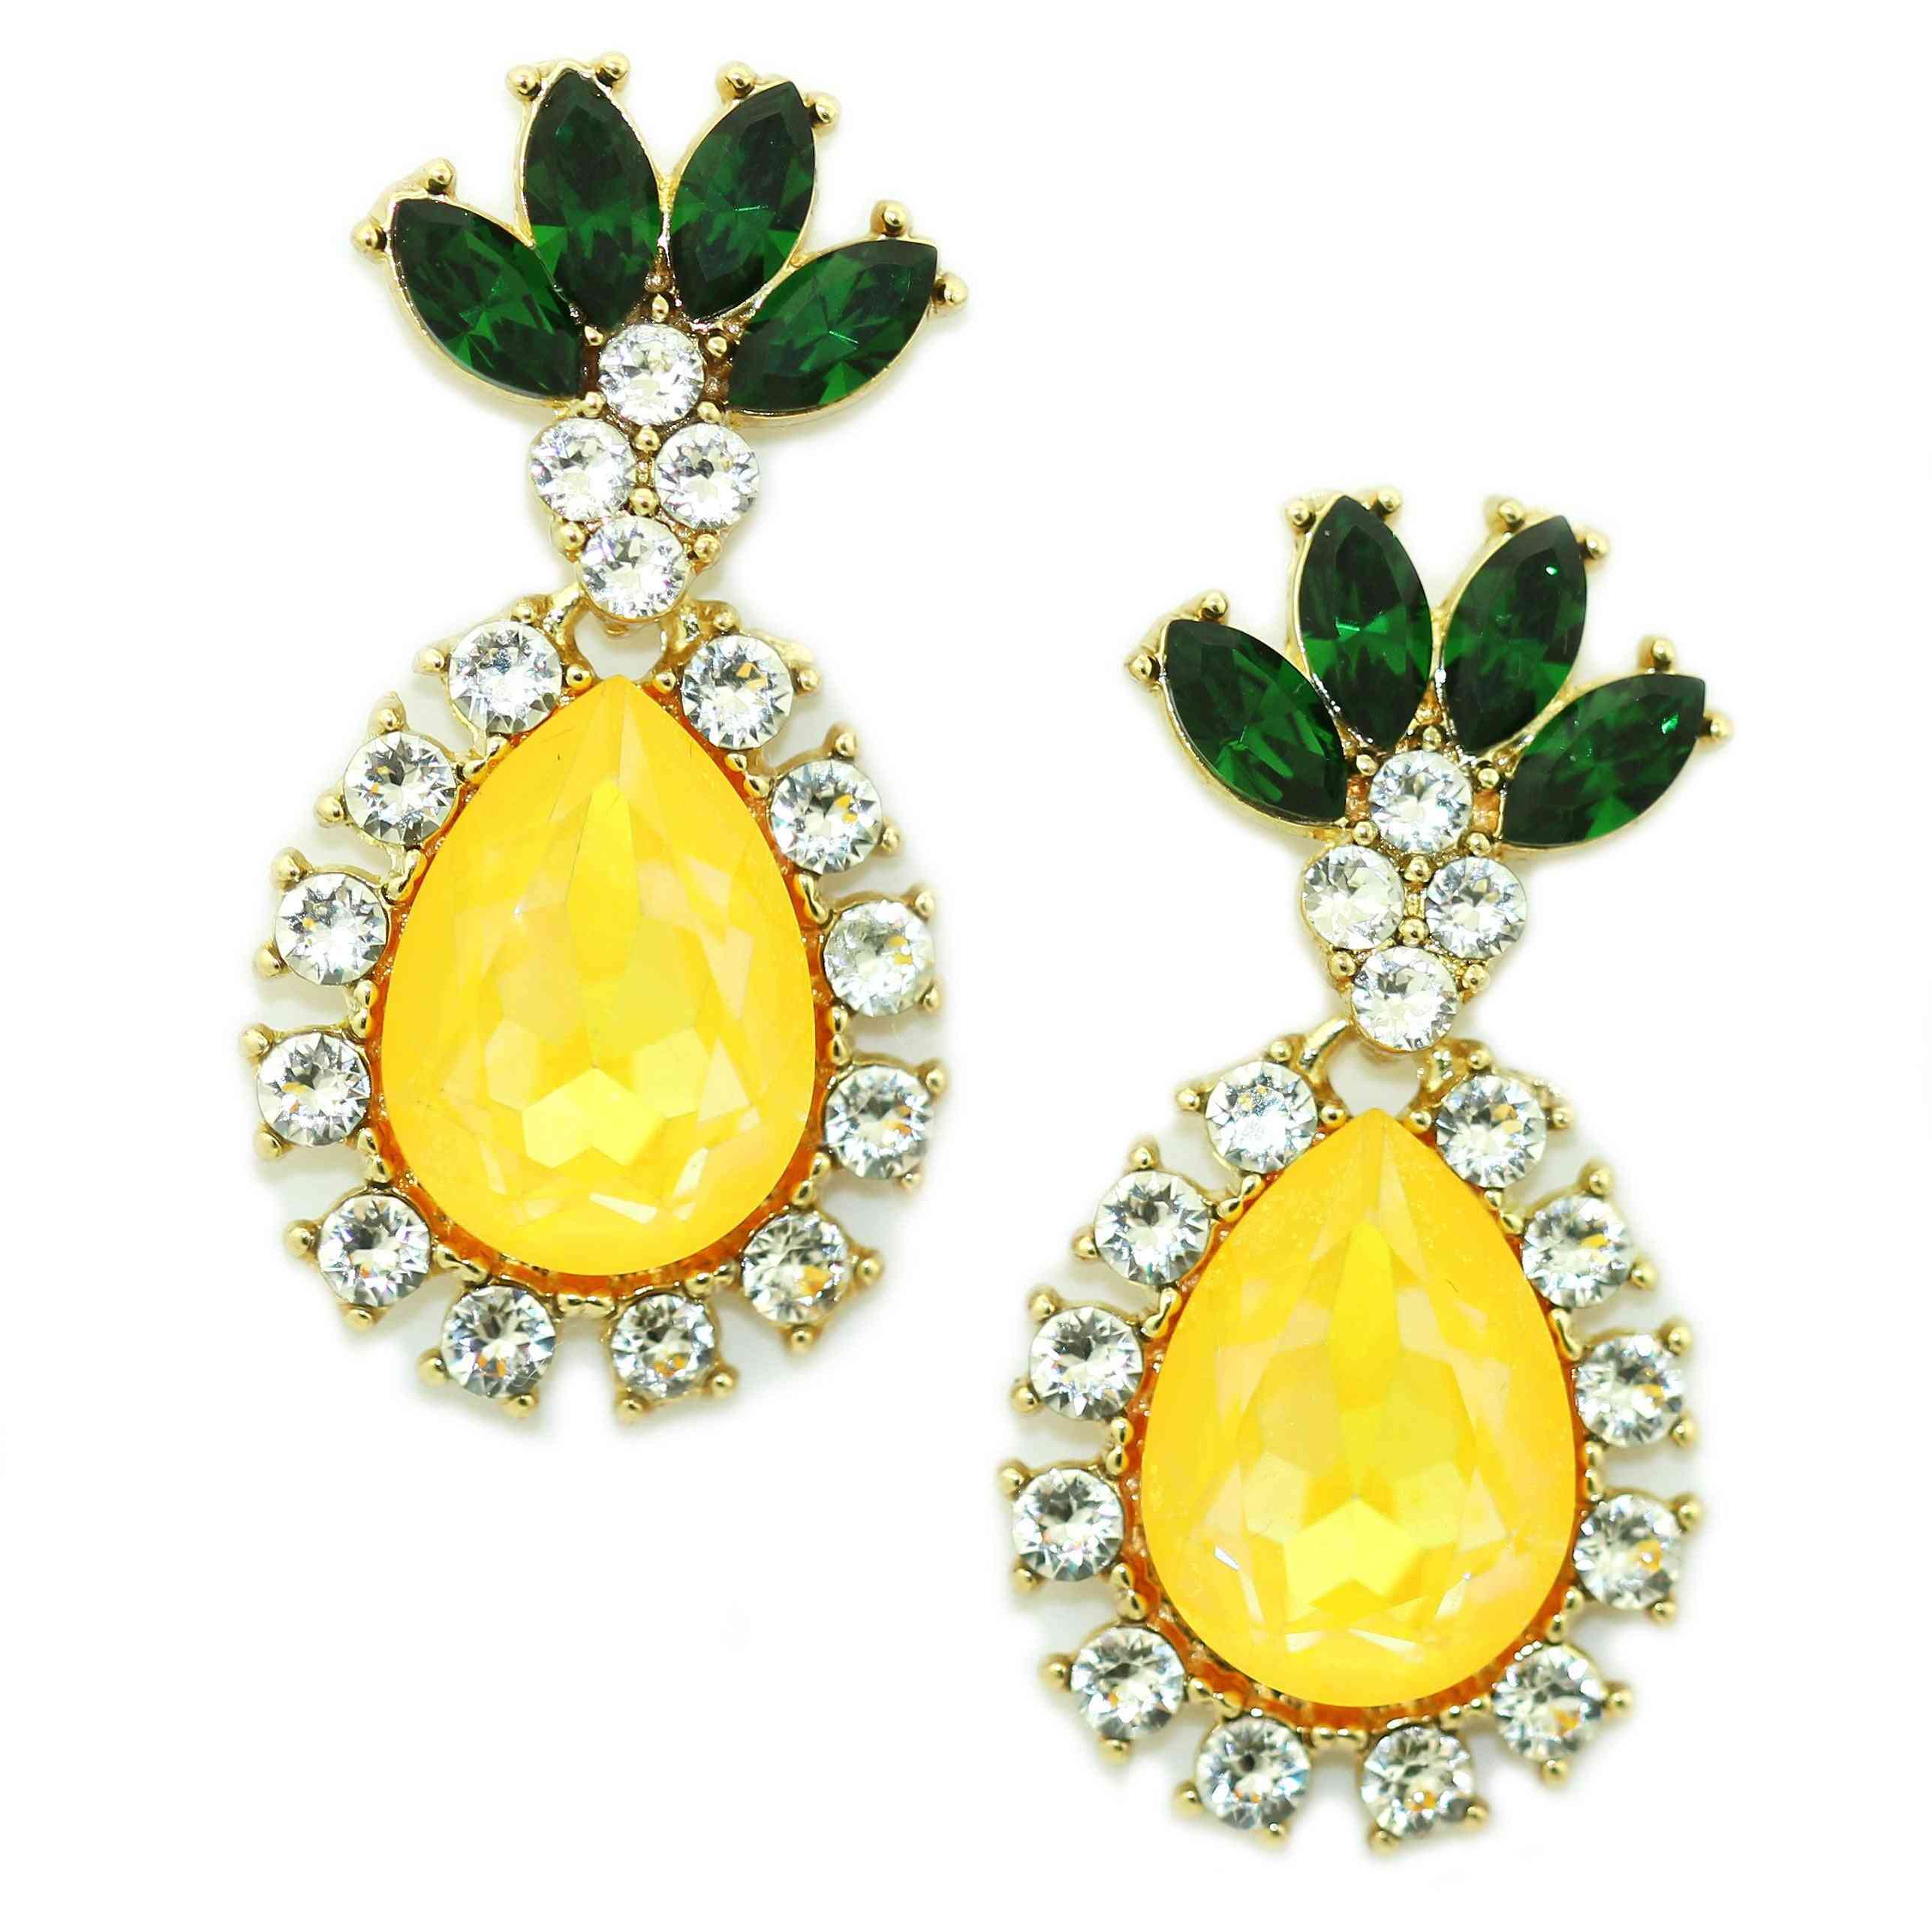 Pineapple Design Drop Earrings